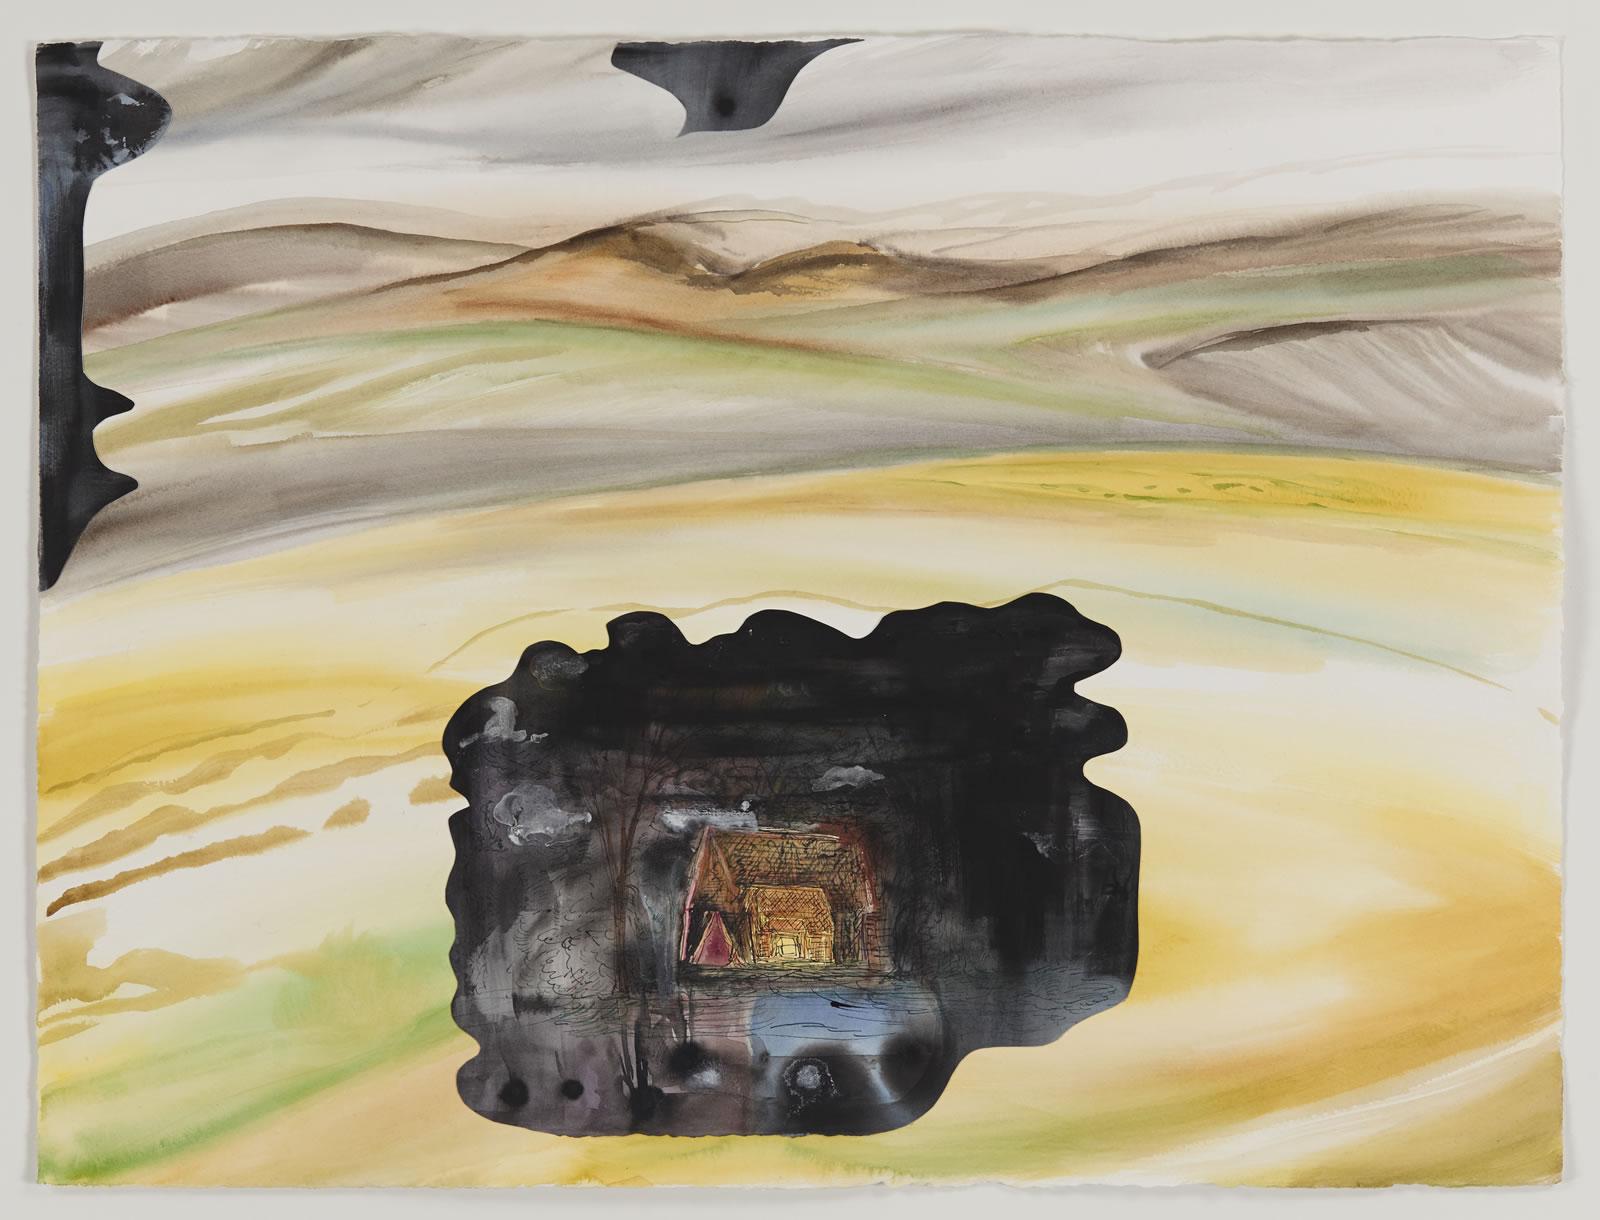 Cabin, watercolor, 2016